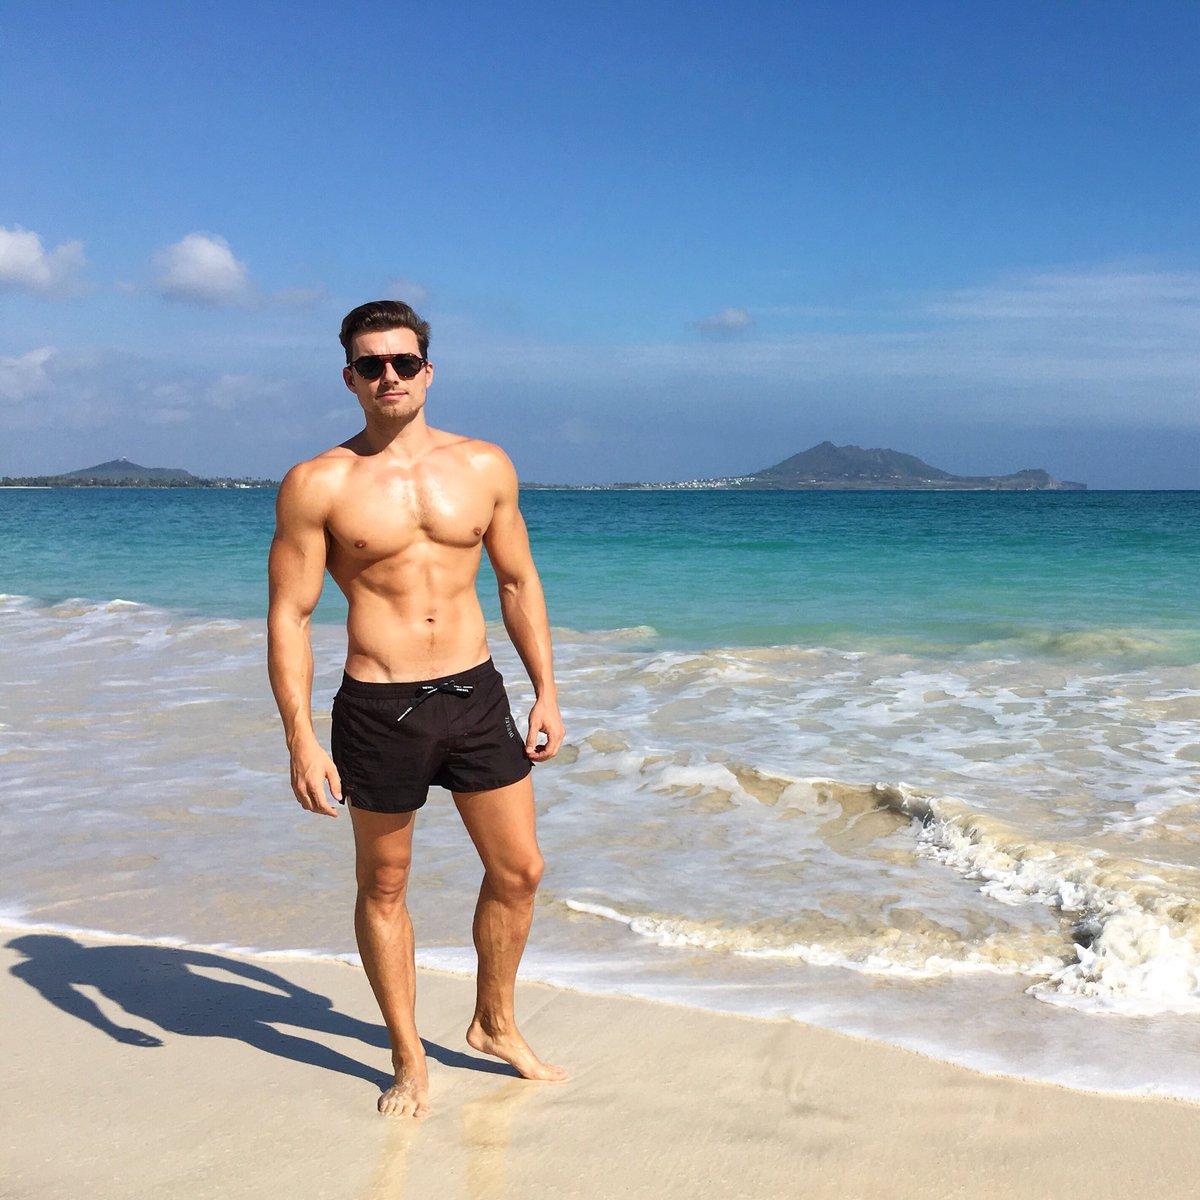 Key West's Island House Gay Resort Taken Off The Market